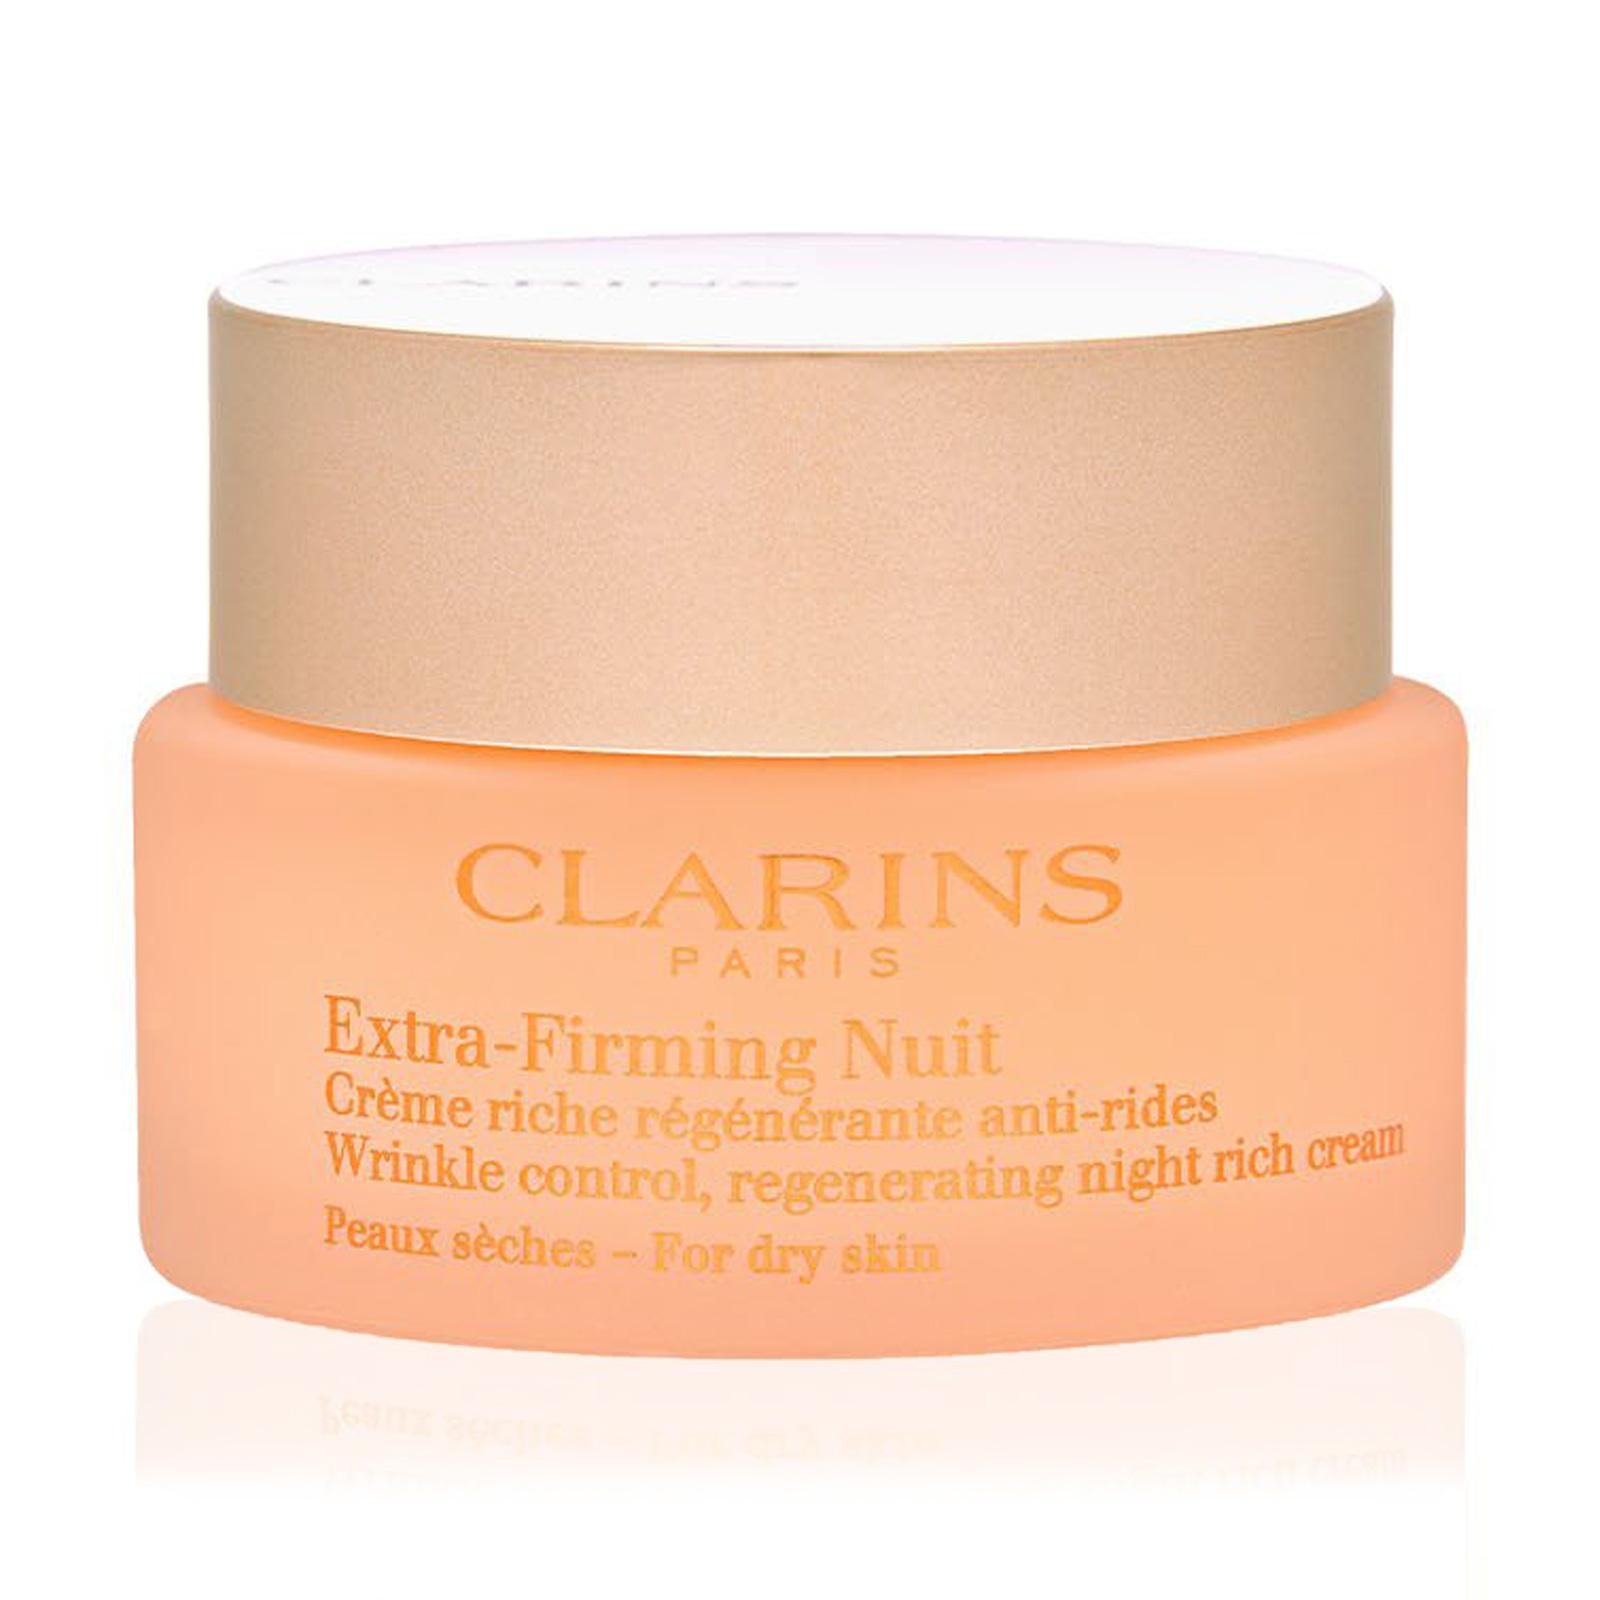 Extra-Firming Wrinkle Control, Regenerating Night Rich Cream